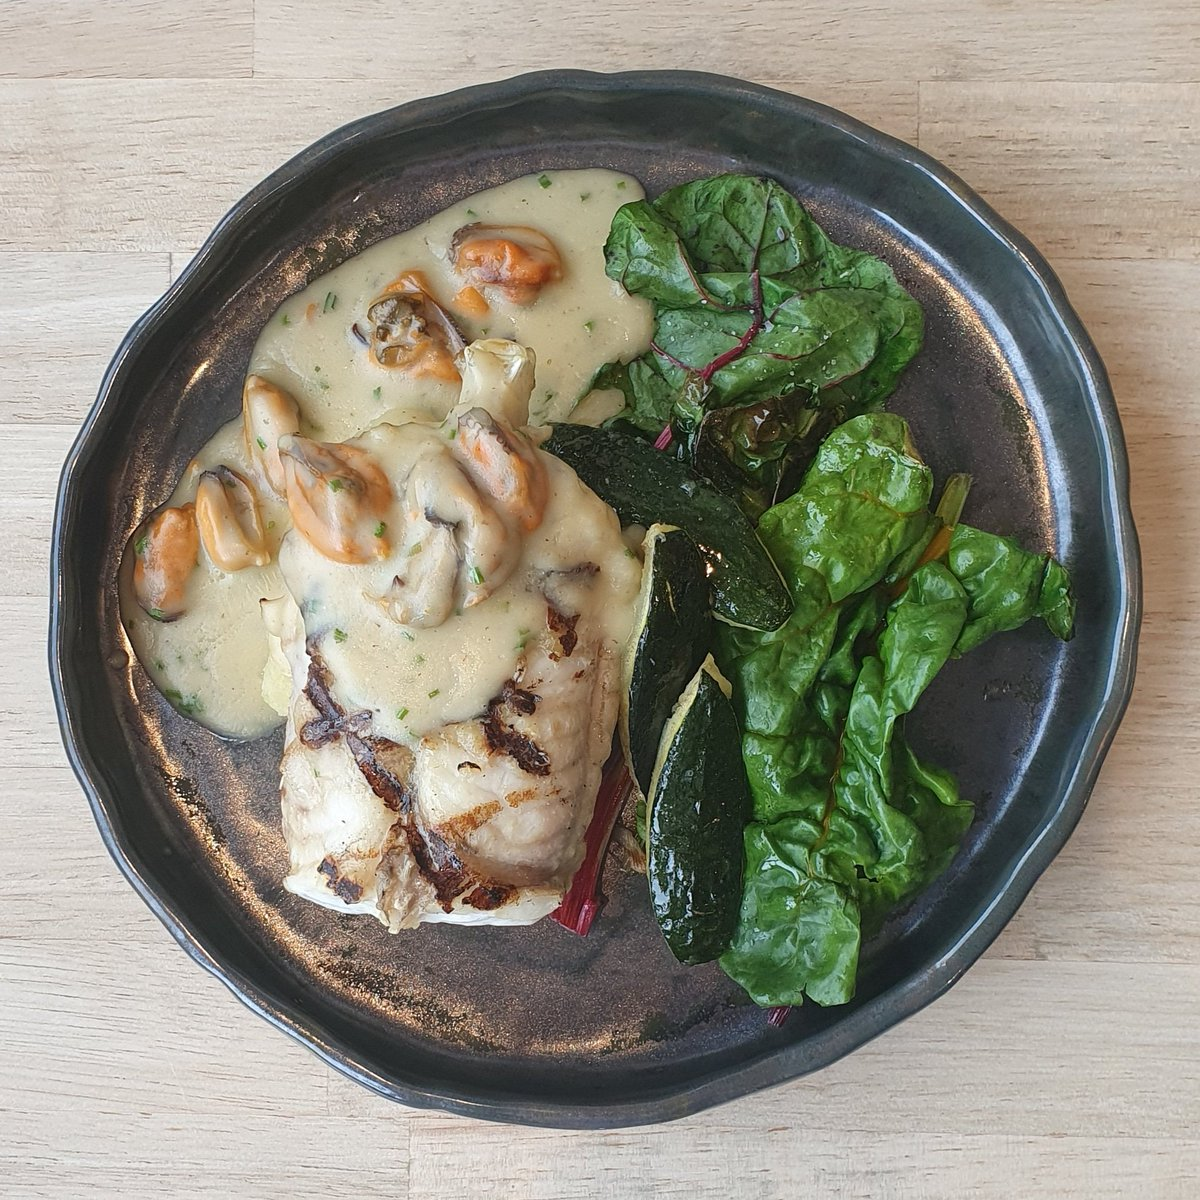 Roast monkfish on the bone, courgette,  rainbow chard, valor potatoes,  Kelly's mussel & elderflower sauce #mains #eatin #takeaway #fish #openatlast #woodruffstepaside #woodruffathome #shoplocal https://t.co/AywVGWzln6